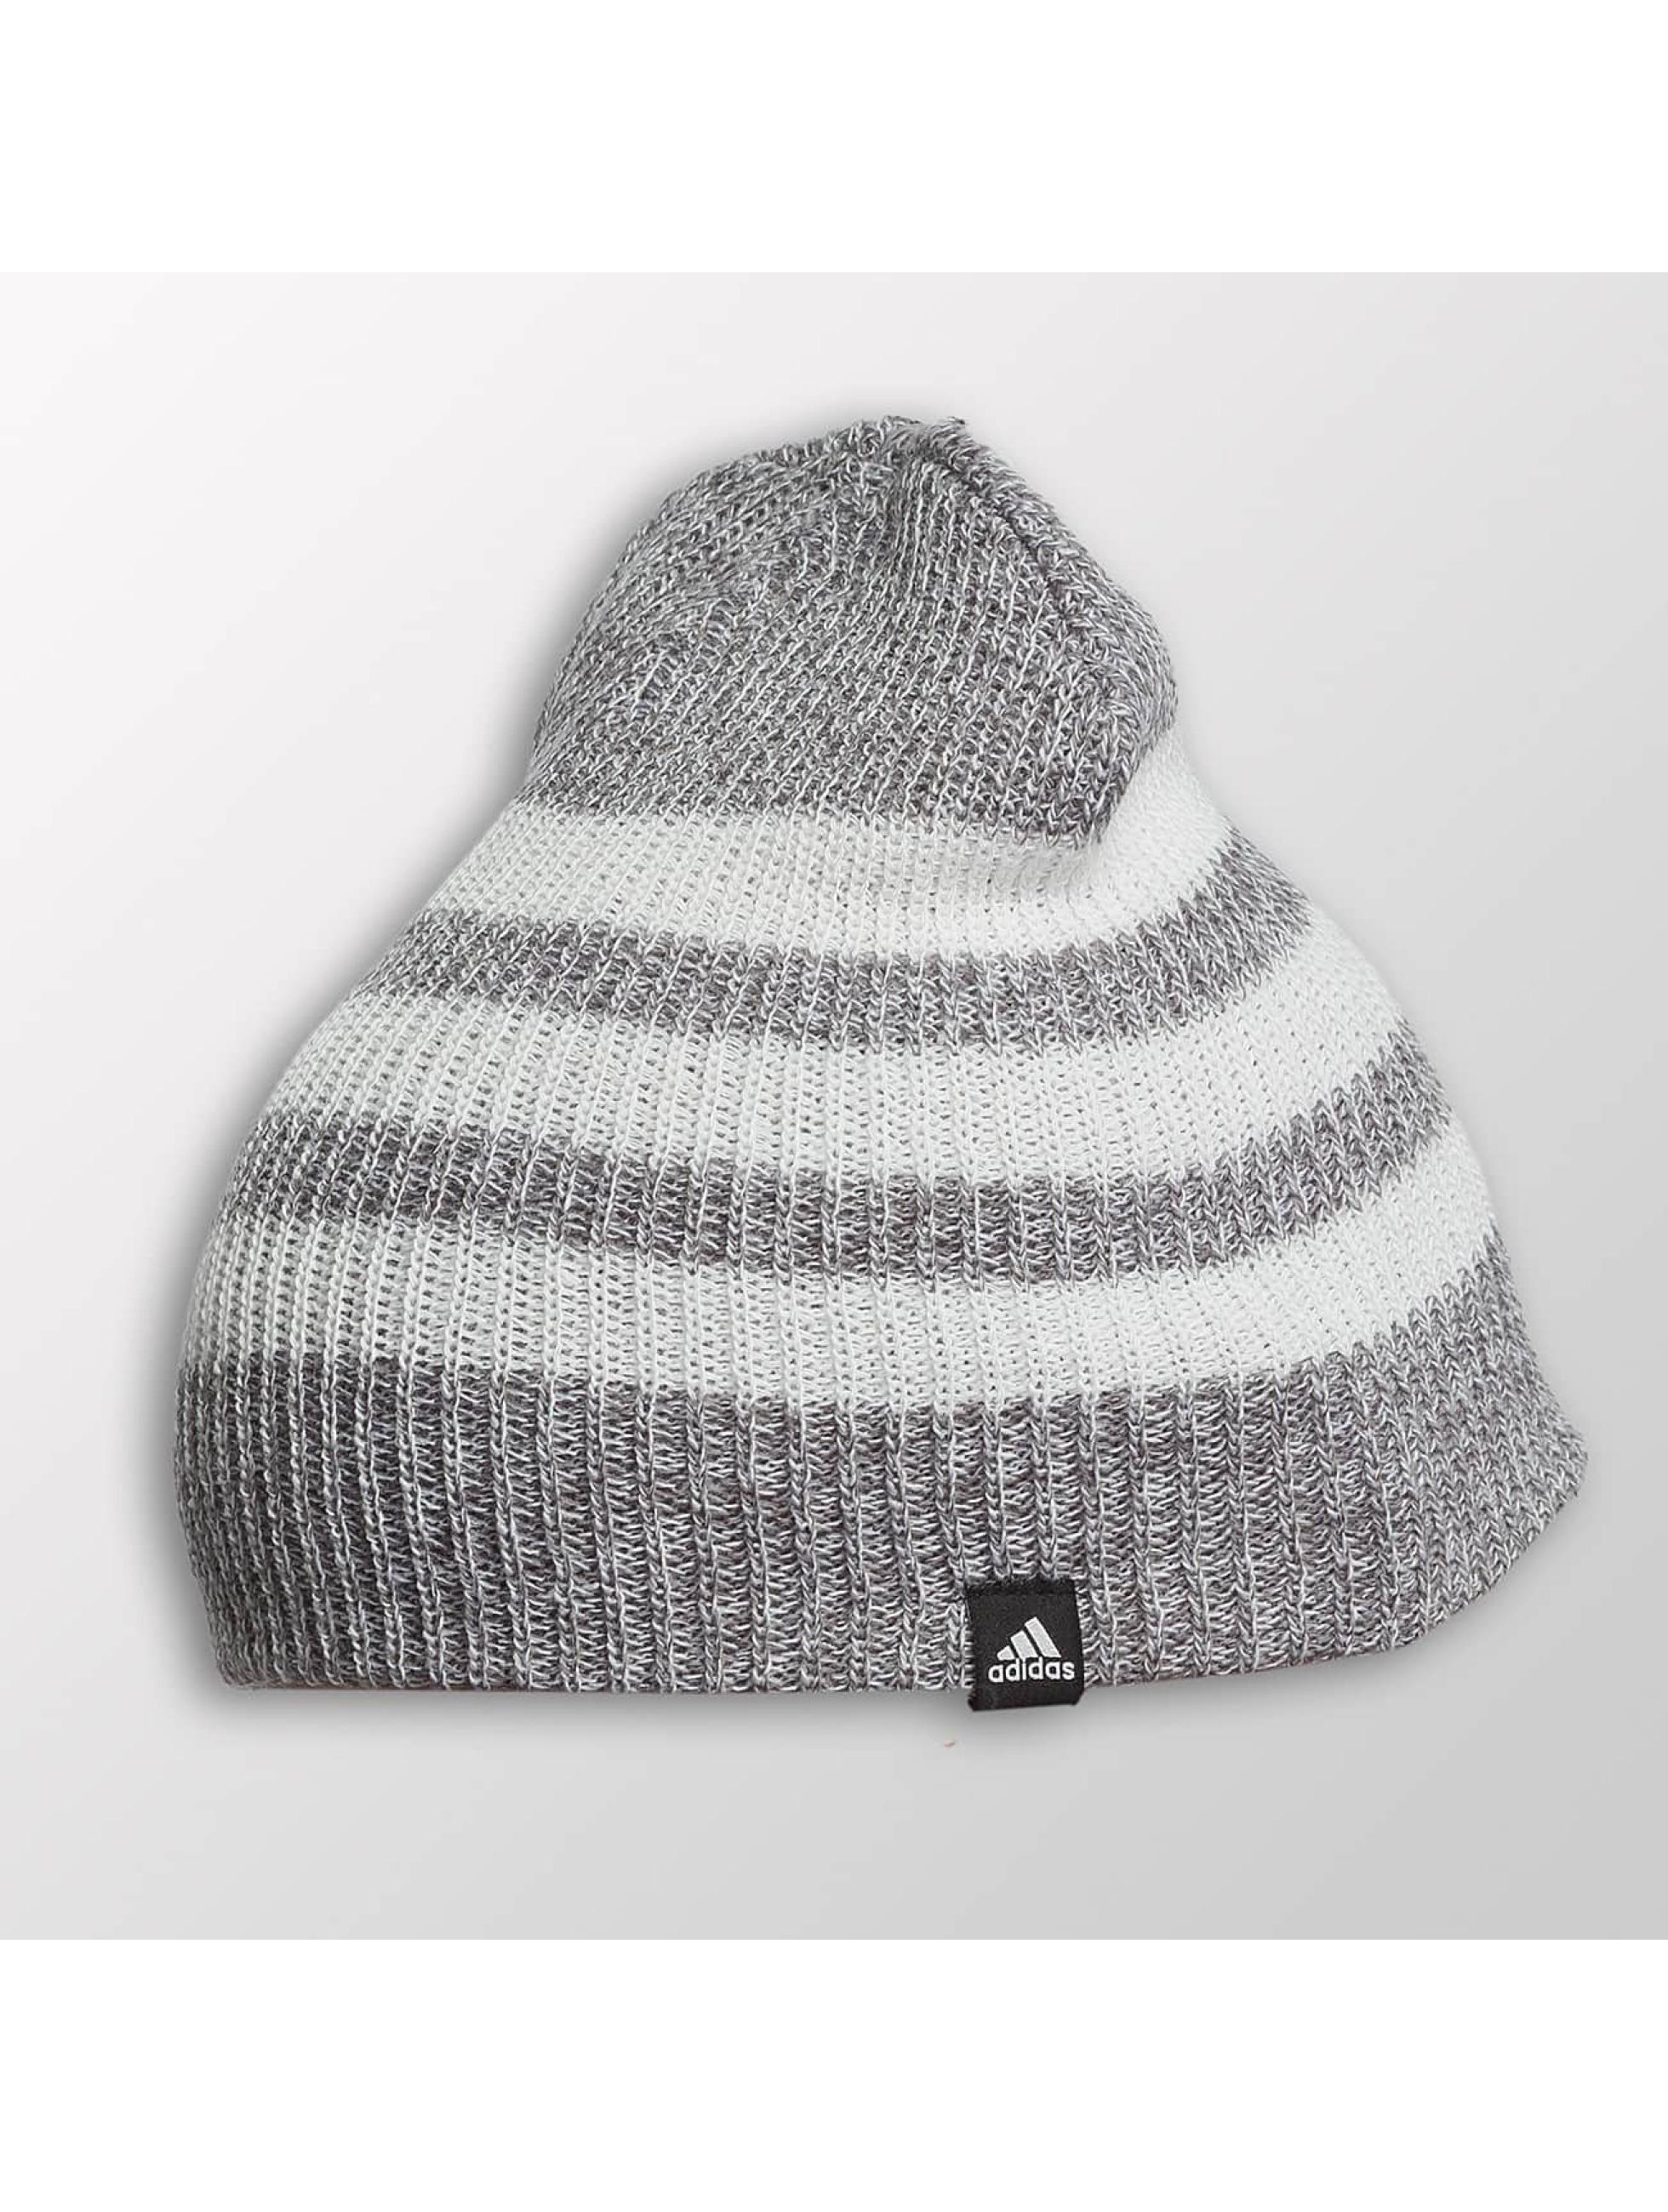 adidas Bonnet Adidas 3S gris